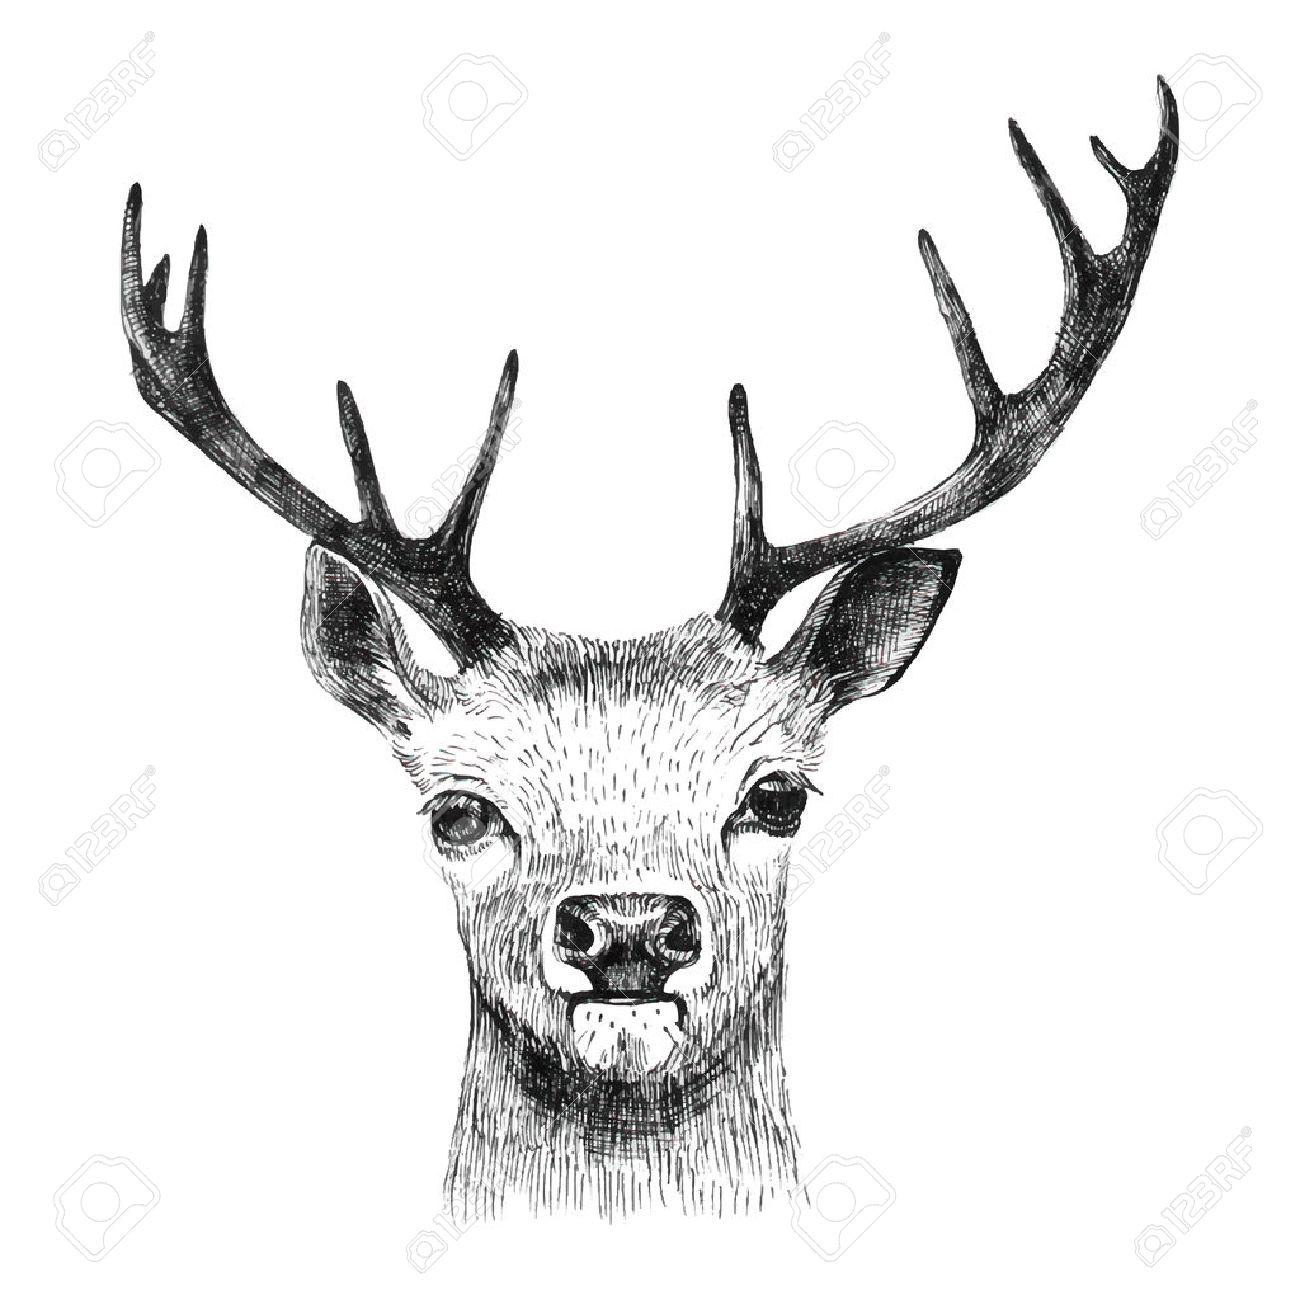 Hand drawn deer on white background - 42020420